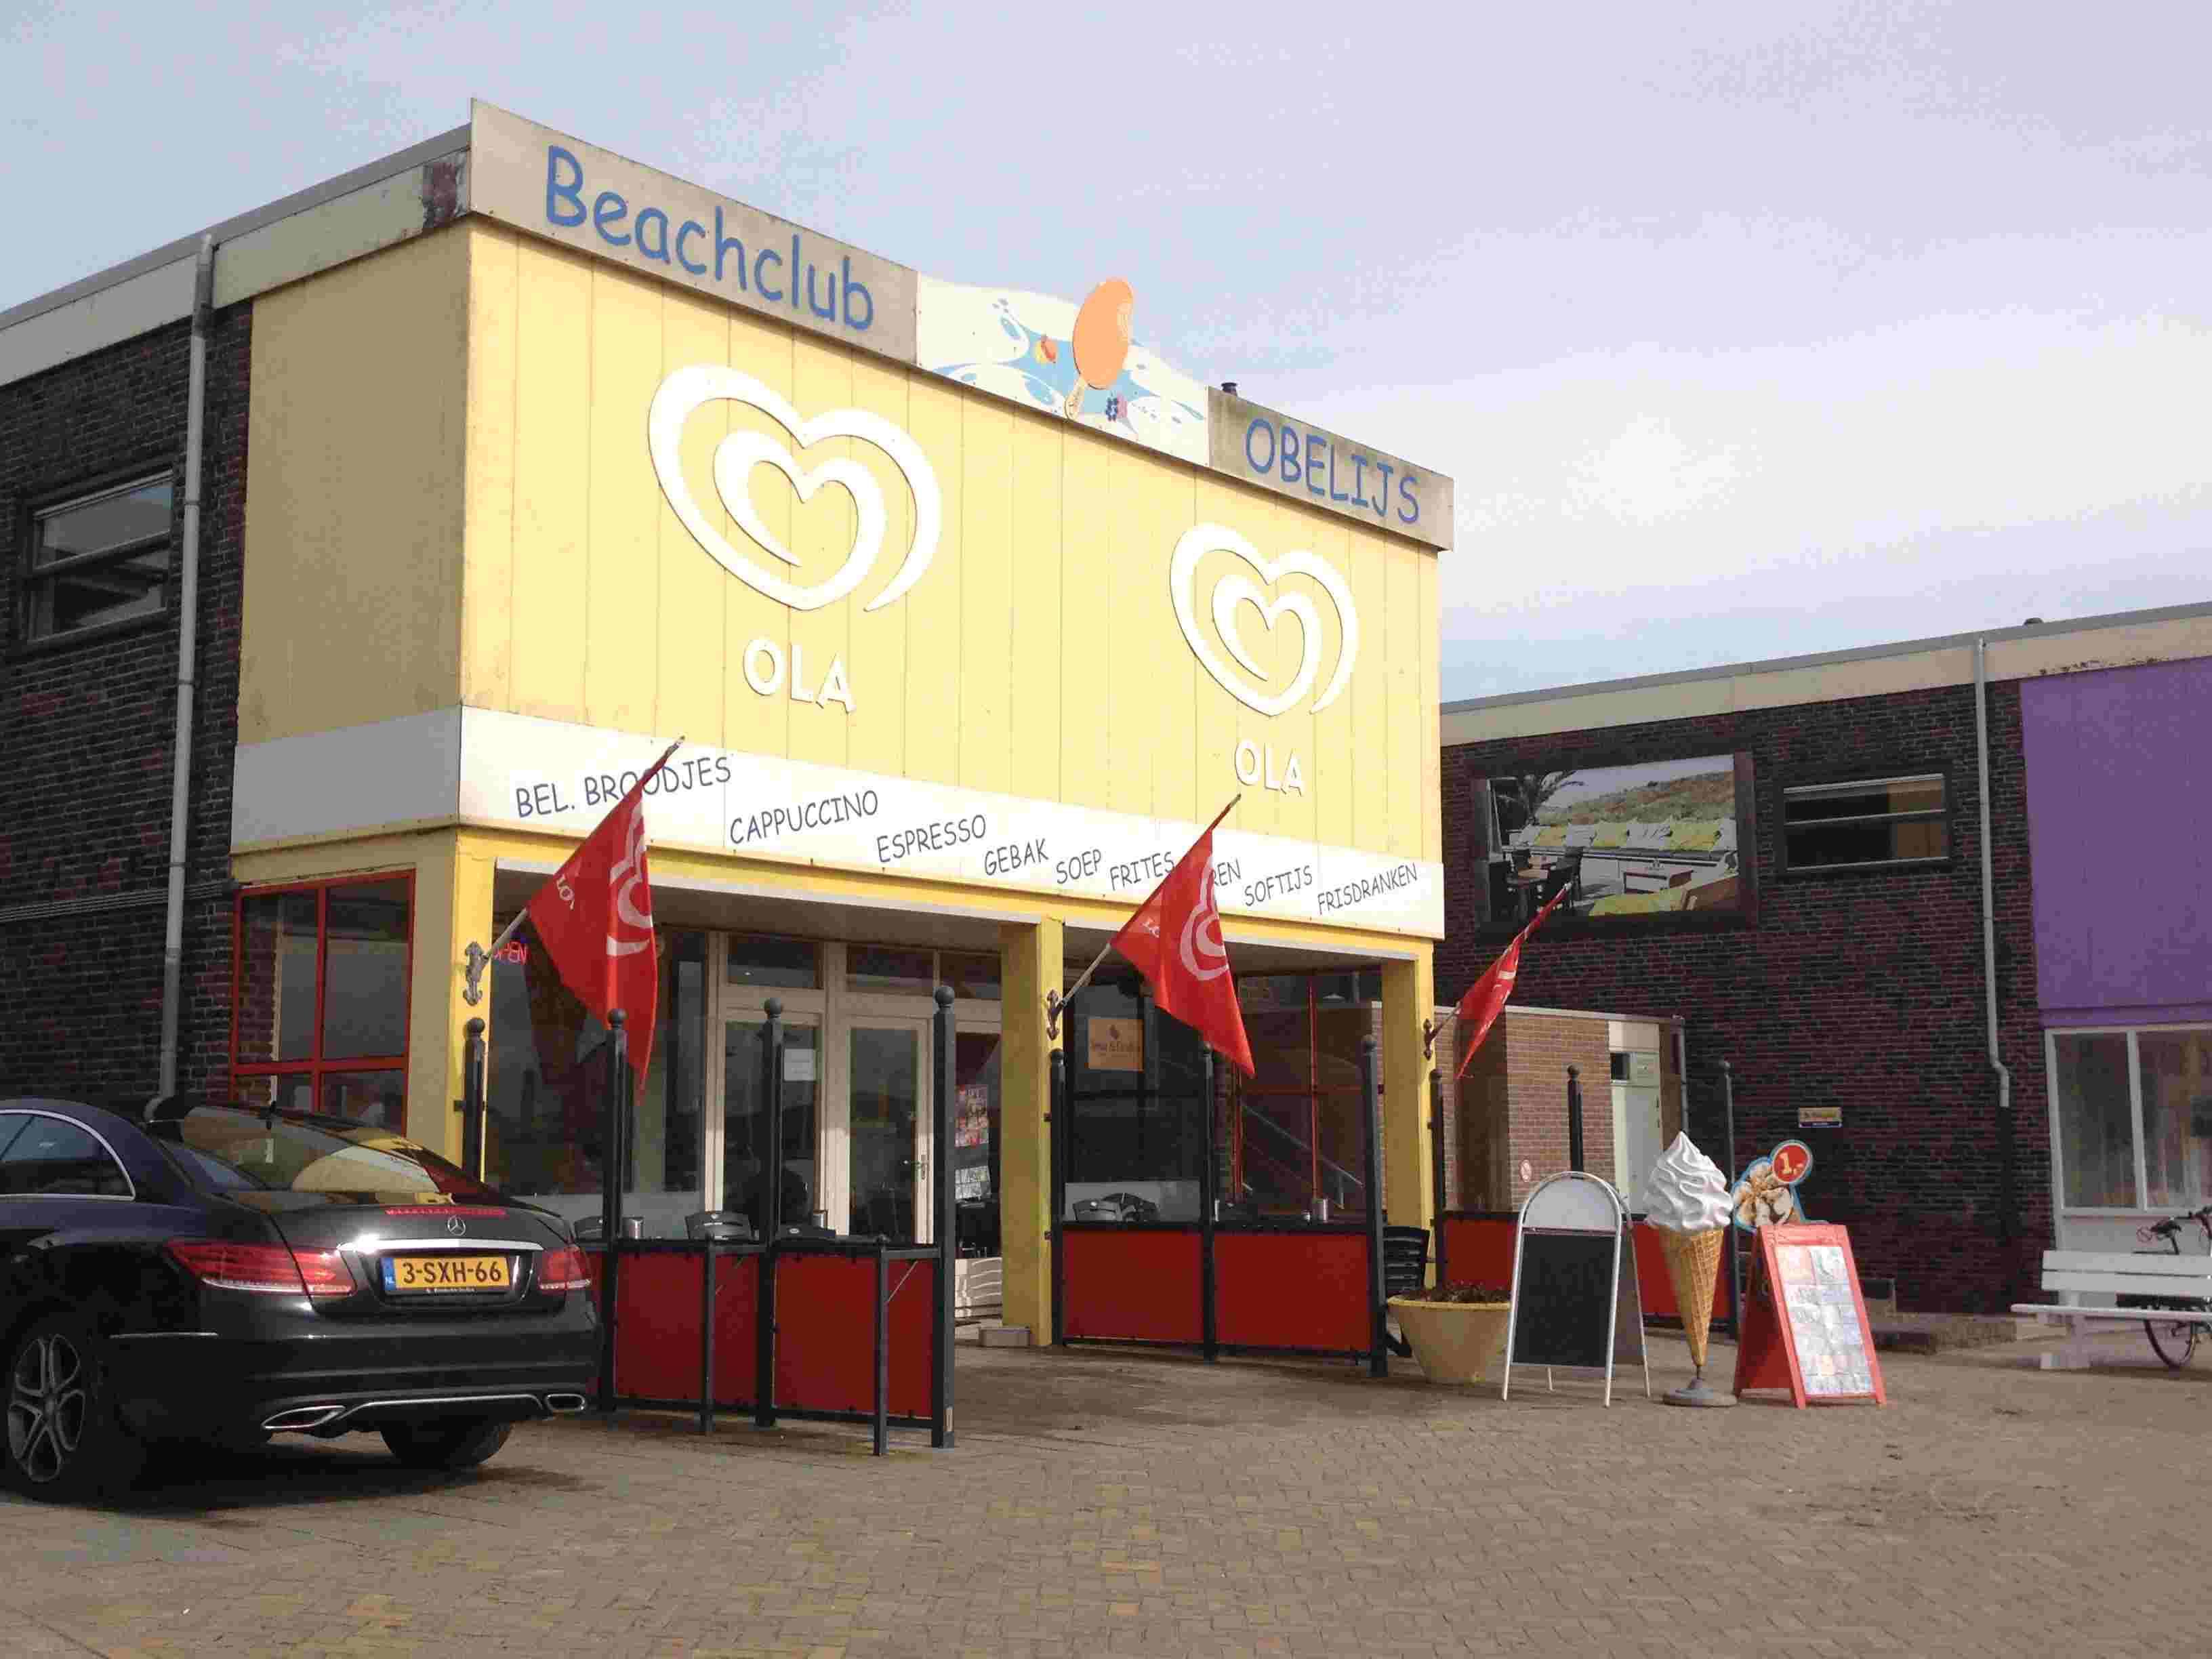 Beachclub Obelijs